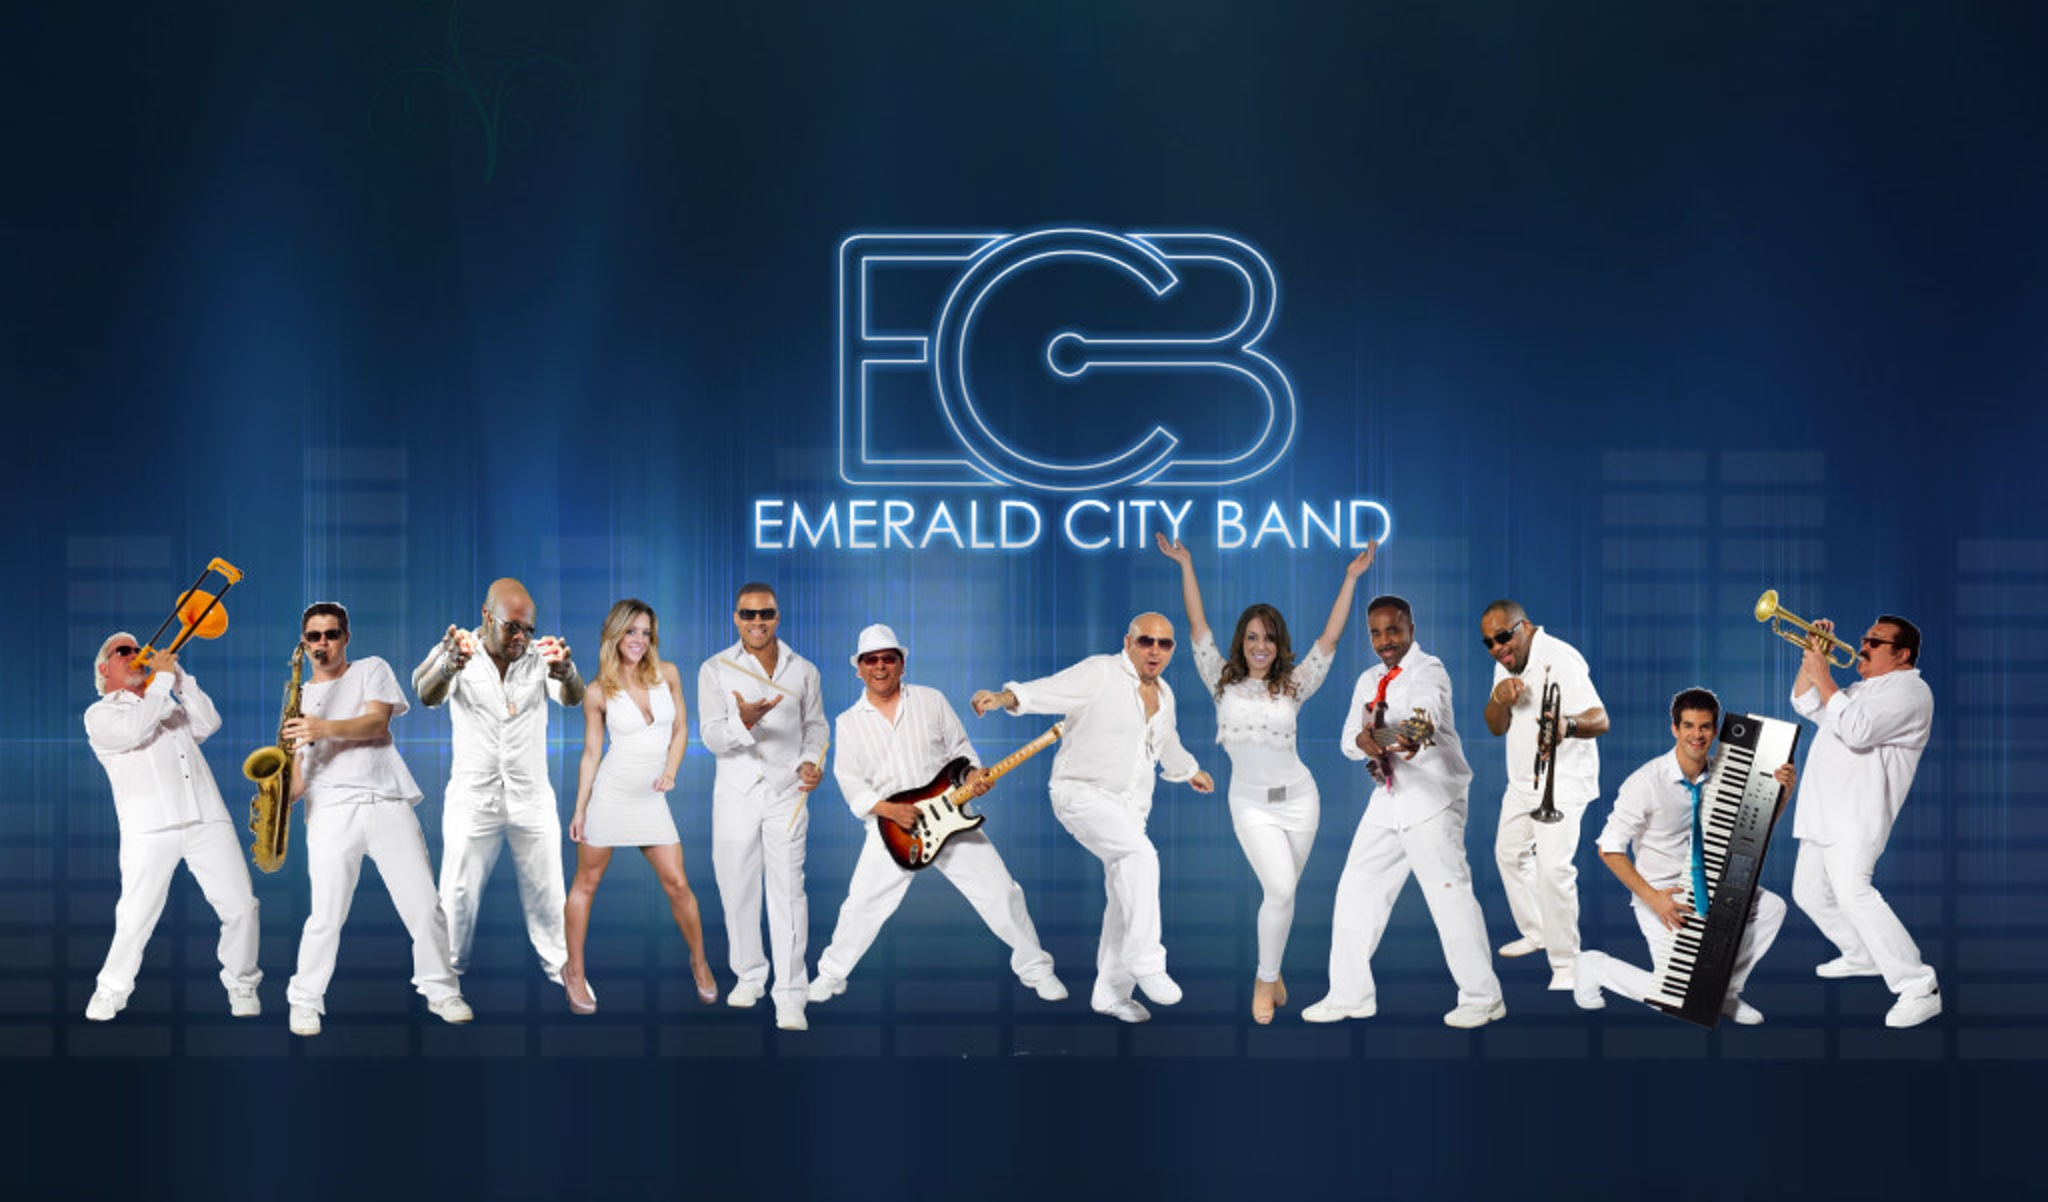 Dallas band - Emerald City Band